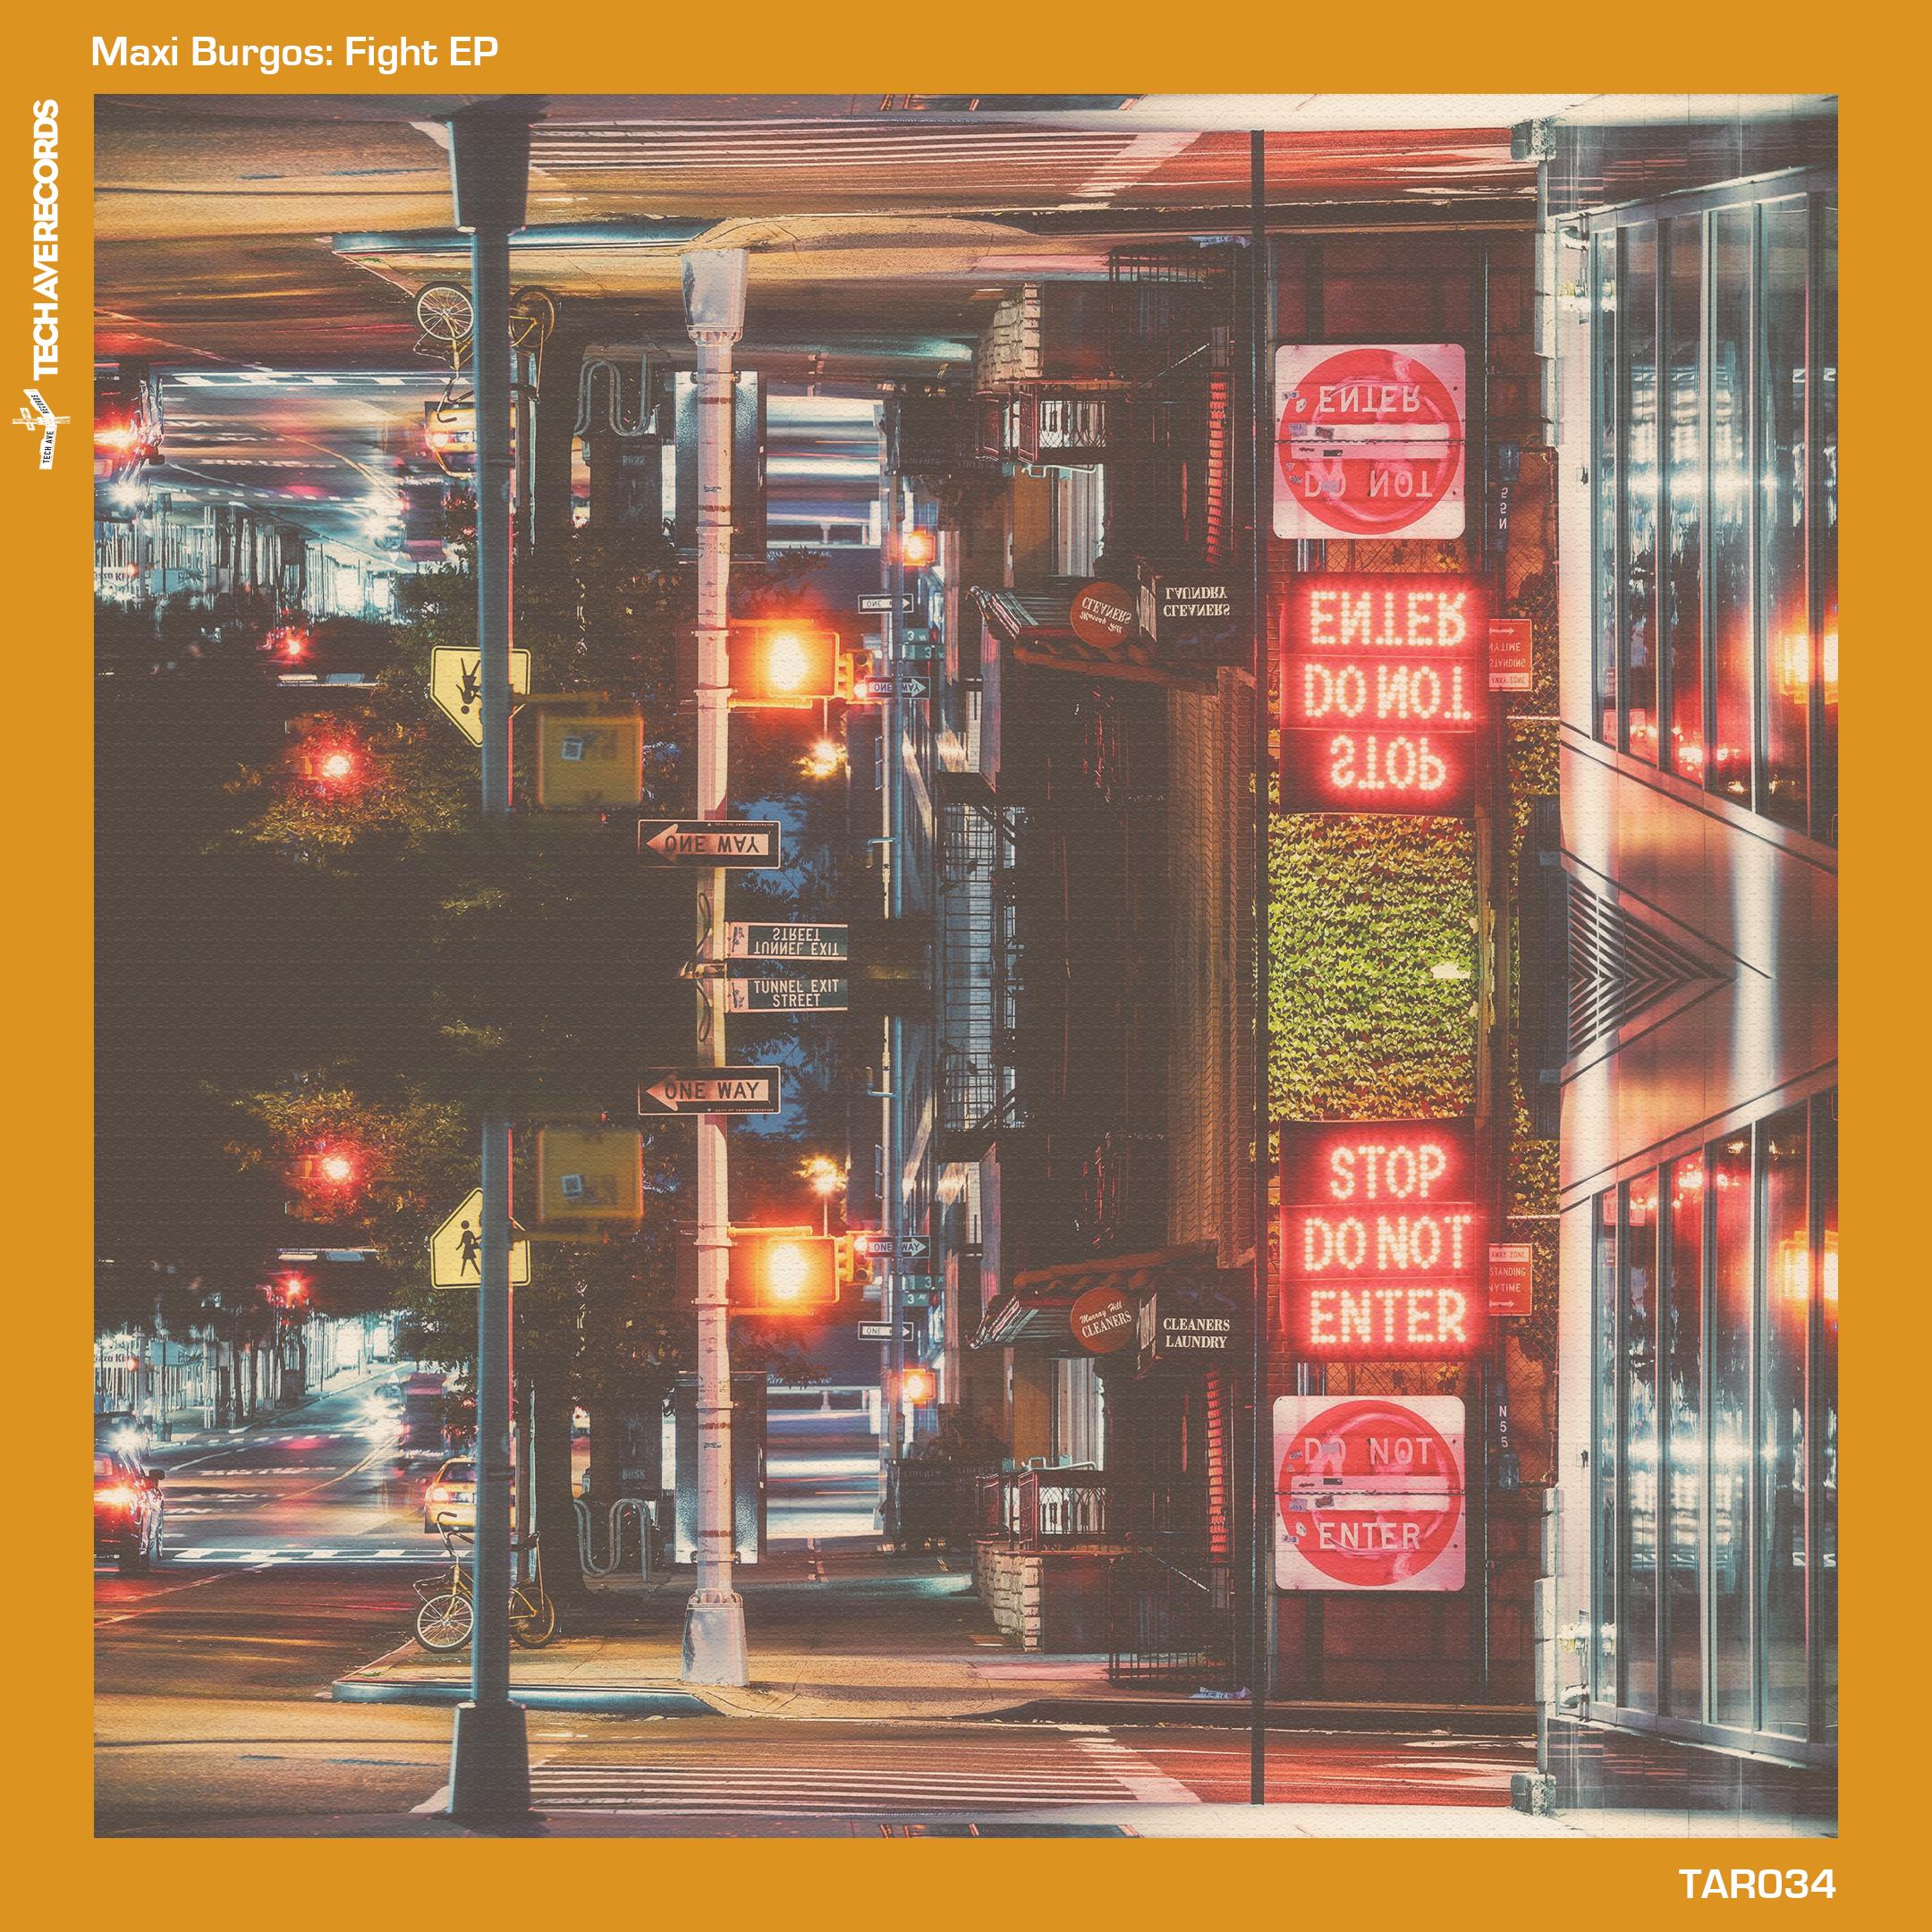 Maxi Burgos: Fight EP on Tech Avenue Records Image